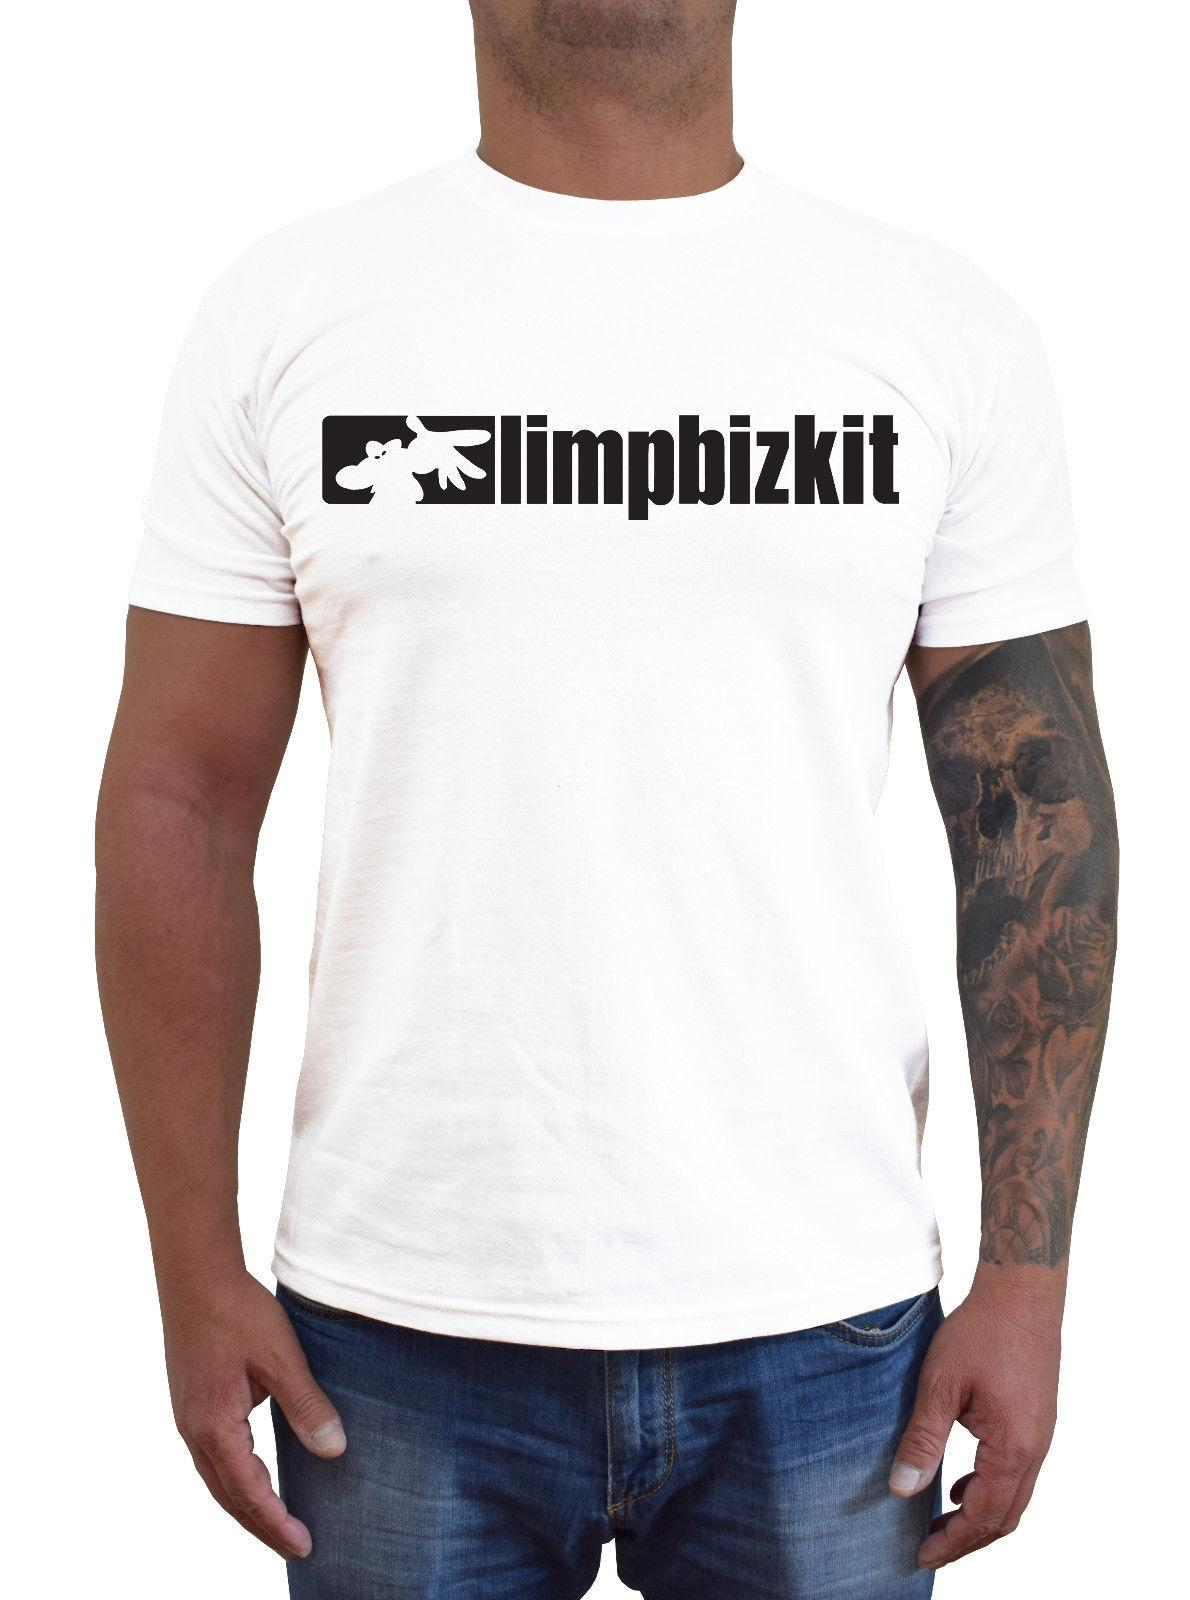 45048128a LIMP BIZKIT Logo Ver. 2 T Shirt White S 5XLFunny Unisex Casual Top Rude T  Shirts Shirt Online From Dragontee, $12.96| DHgate.Com